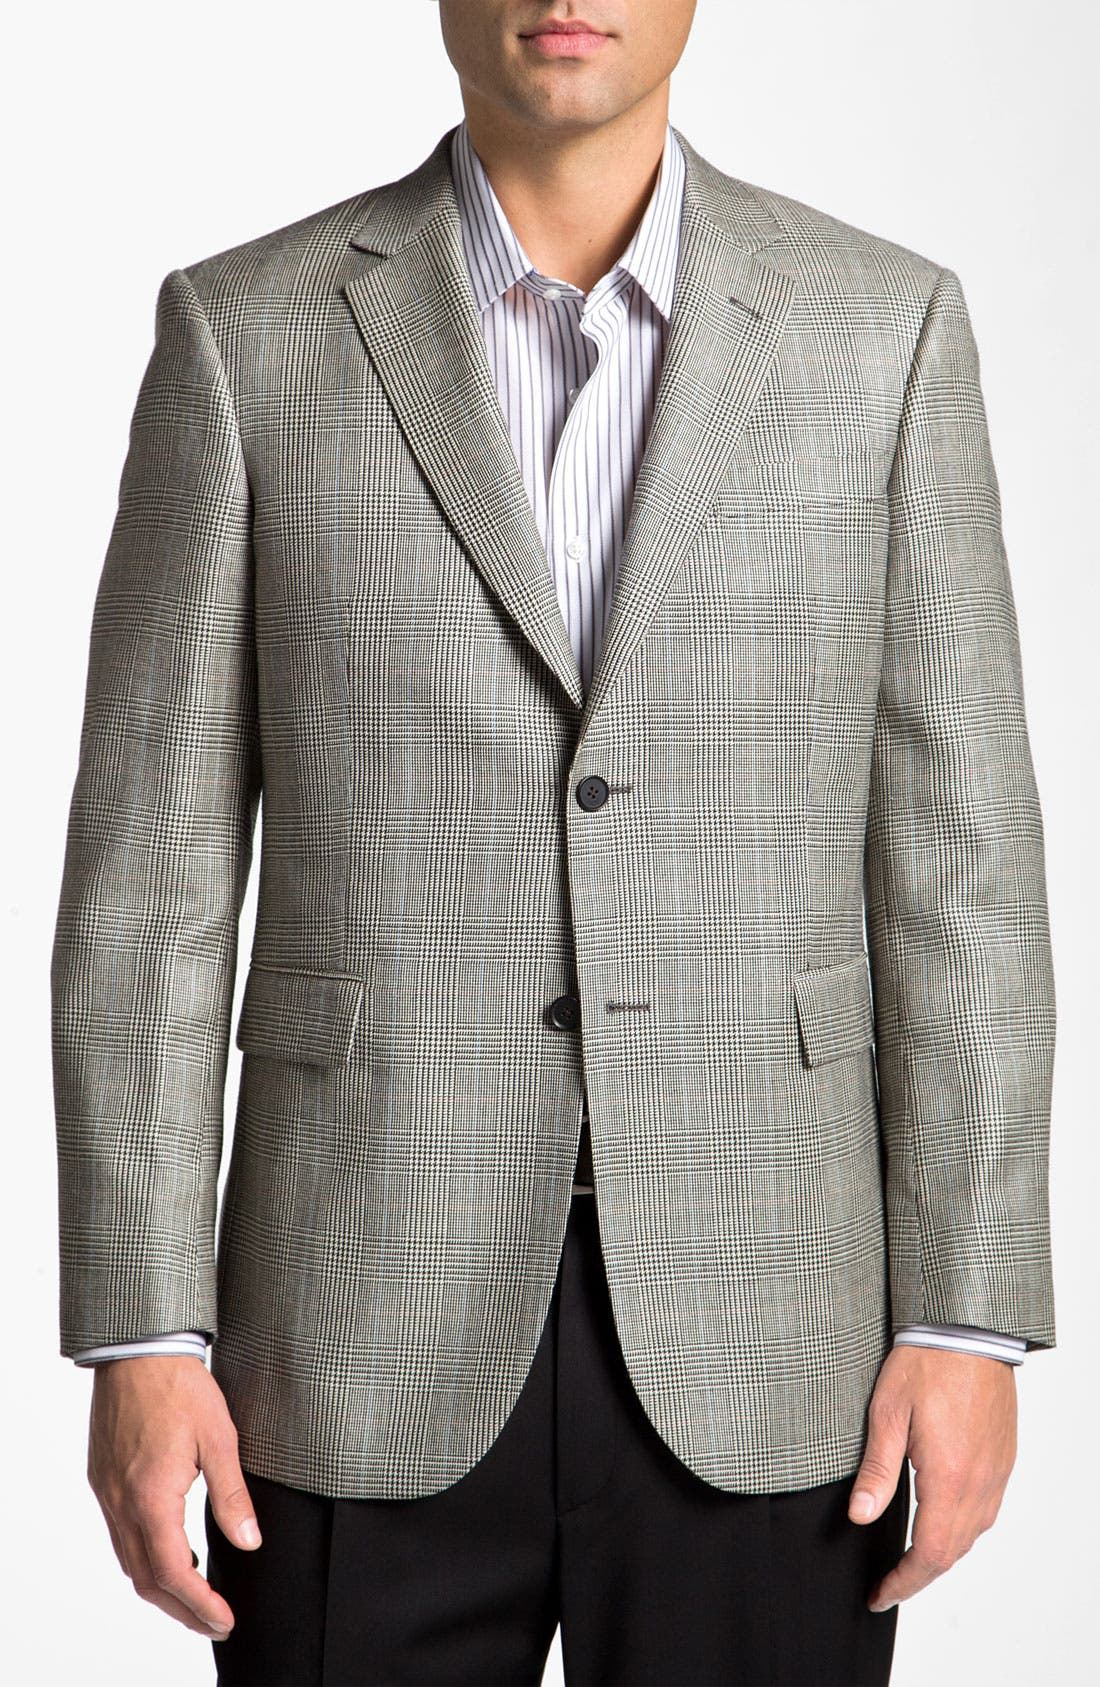 Main Image - John W. Nordstrom® Plaid Sportcoat